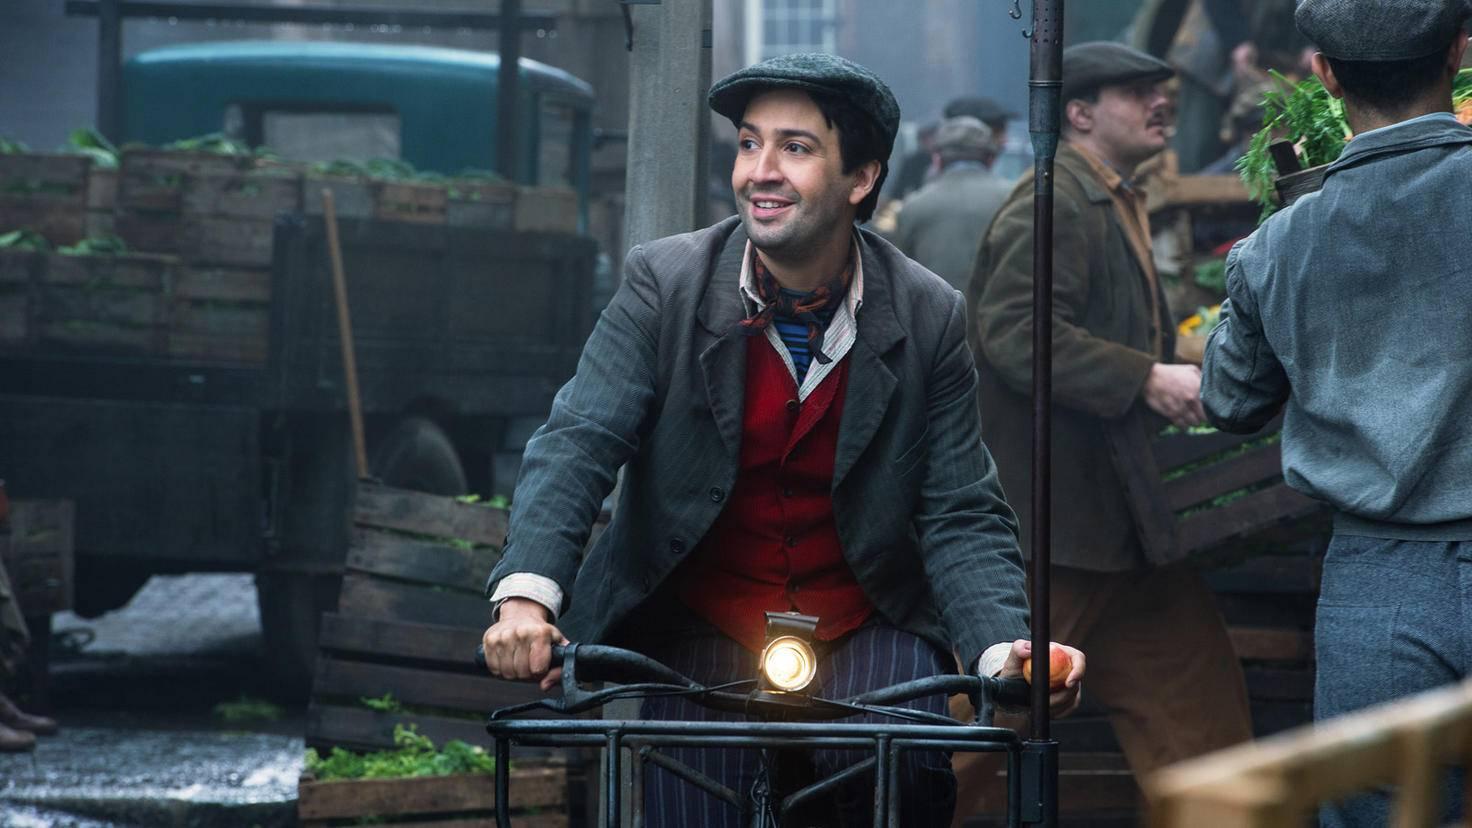 Mary Poppins Rückkehr-Lin-Manuel Miranda-Jay Maidment-Disney-2